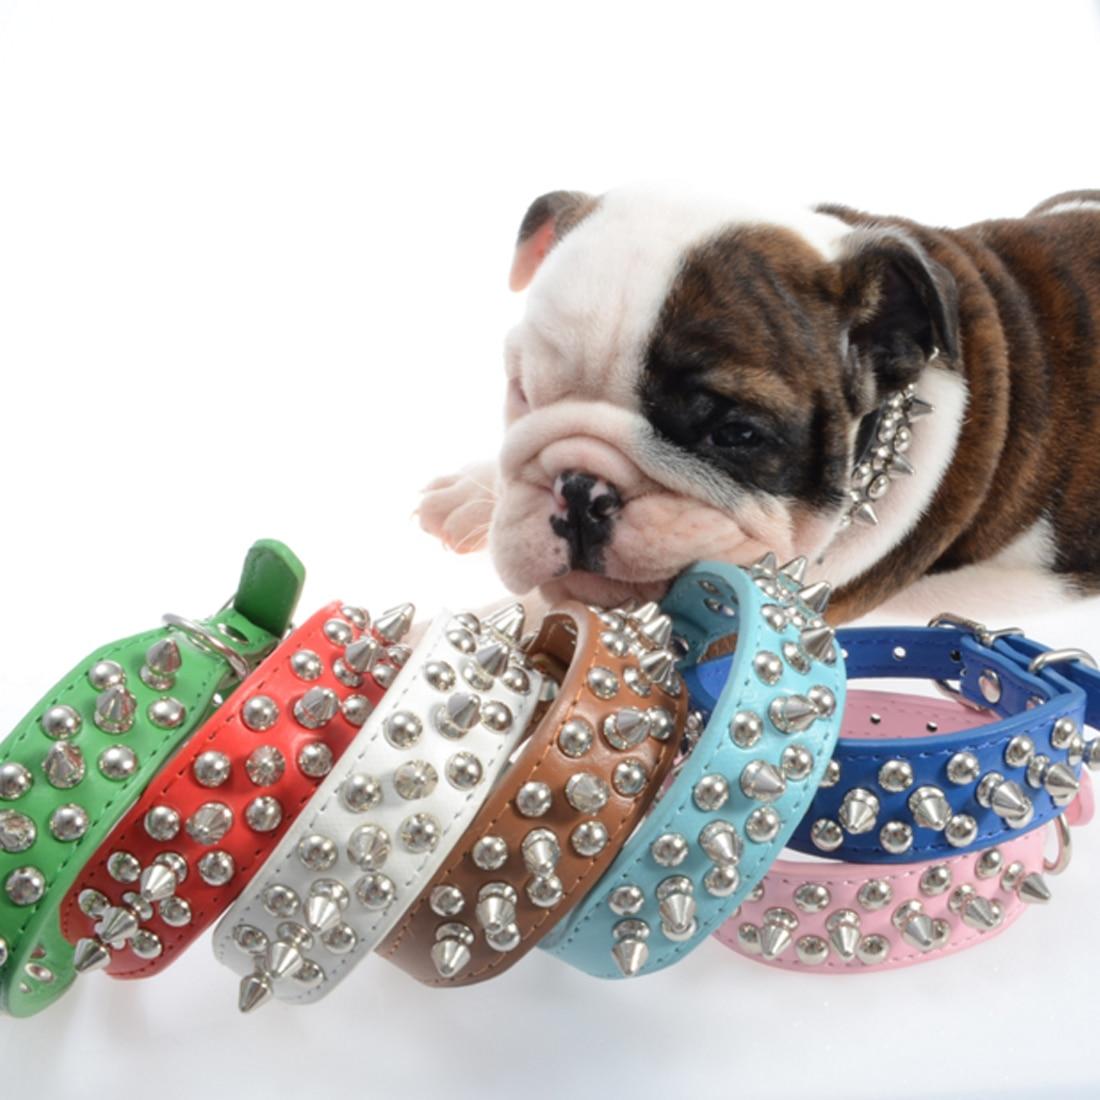 XL-L perro Color caramelo de remache de cuero punta Collar para mascota tachonado perro ajustable cuello Collar Collare de caña